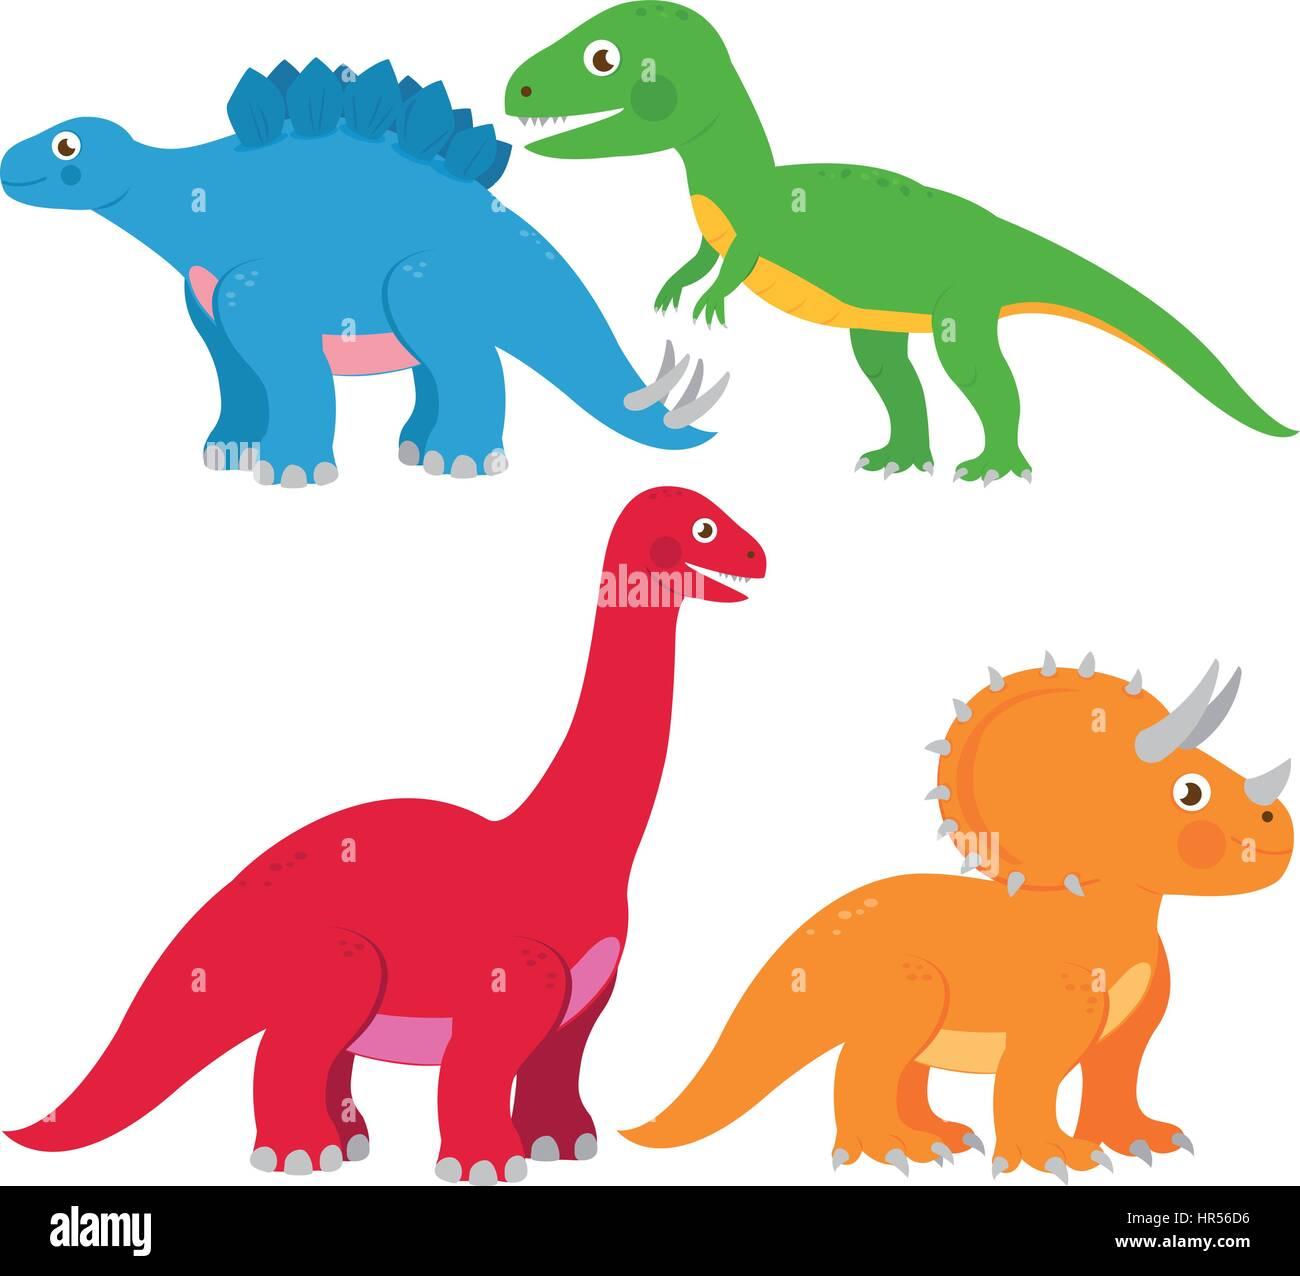 Vector illustration set of dinosaurs: Stegosaurus, Brontosaurus, apatosaurus, triceratops, tyrannosaurus - Stock Image